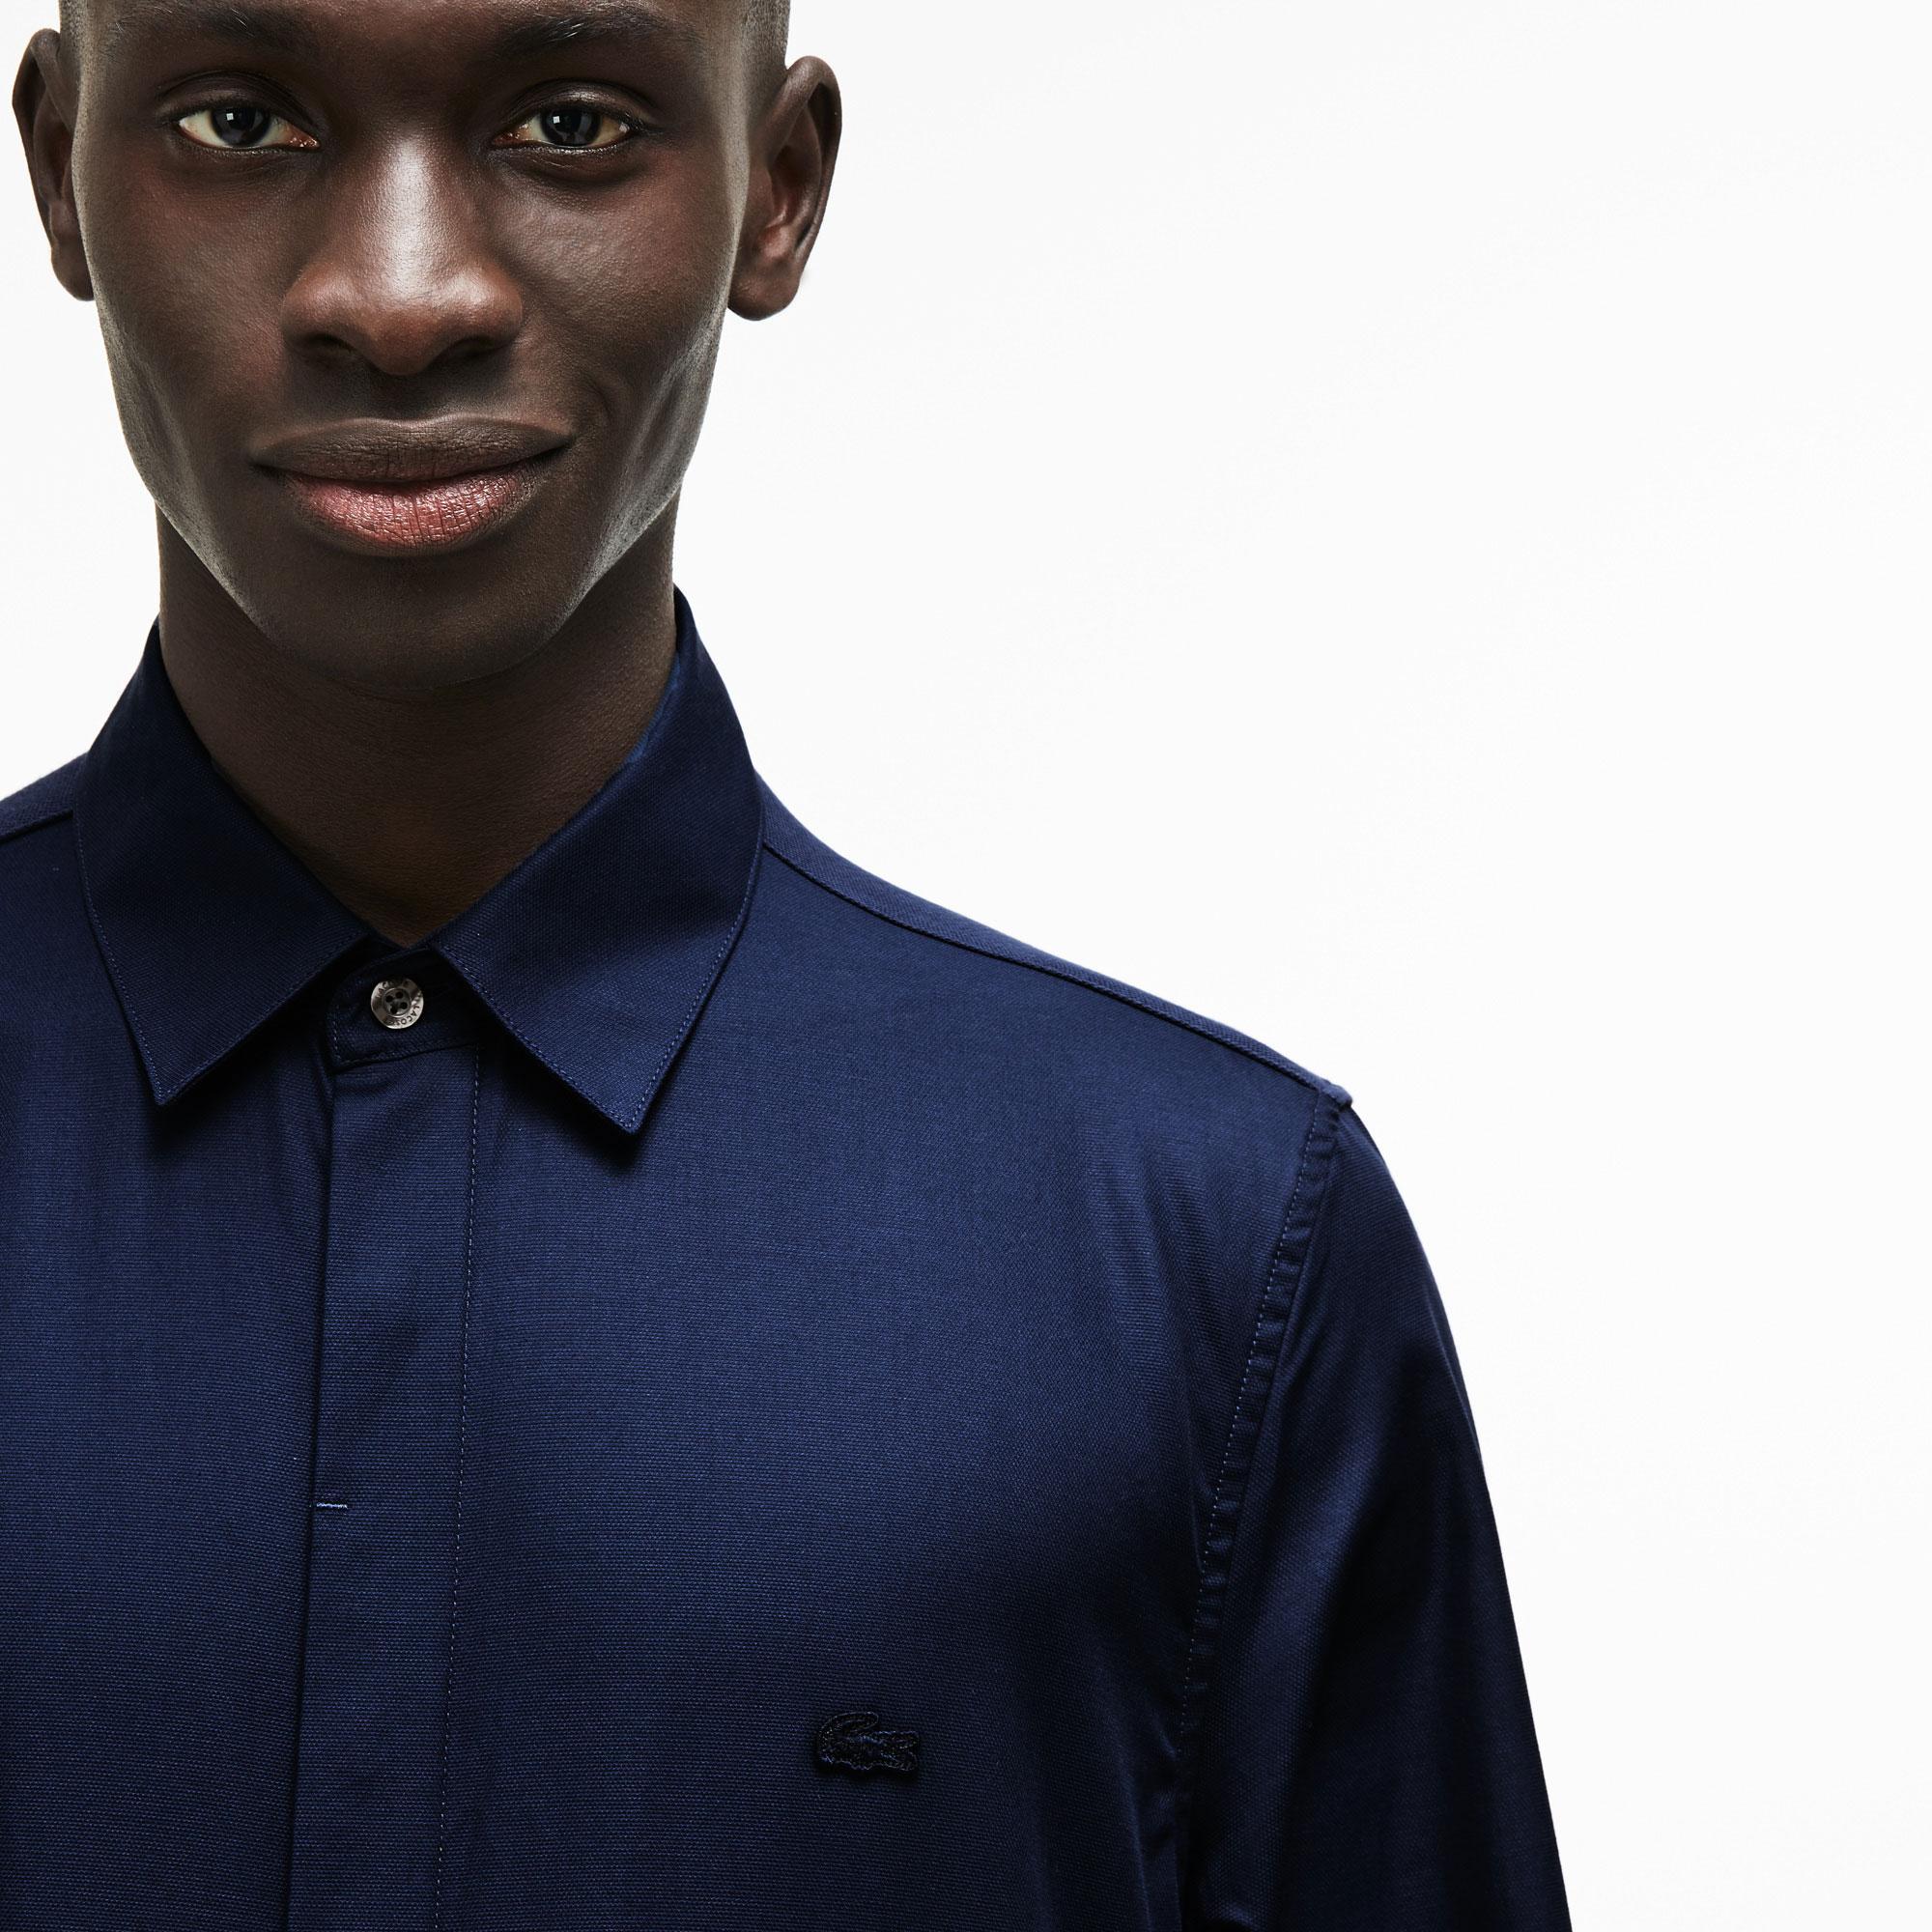 Lacoste Motion Erkek Slim Fit Pike Lacivert Gömlek